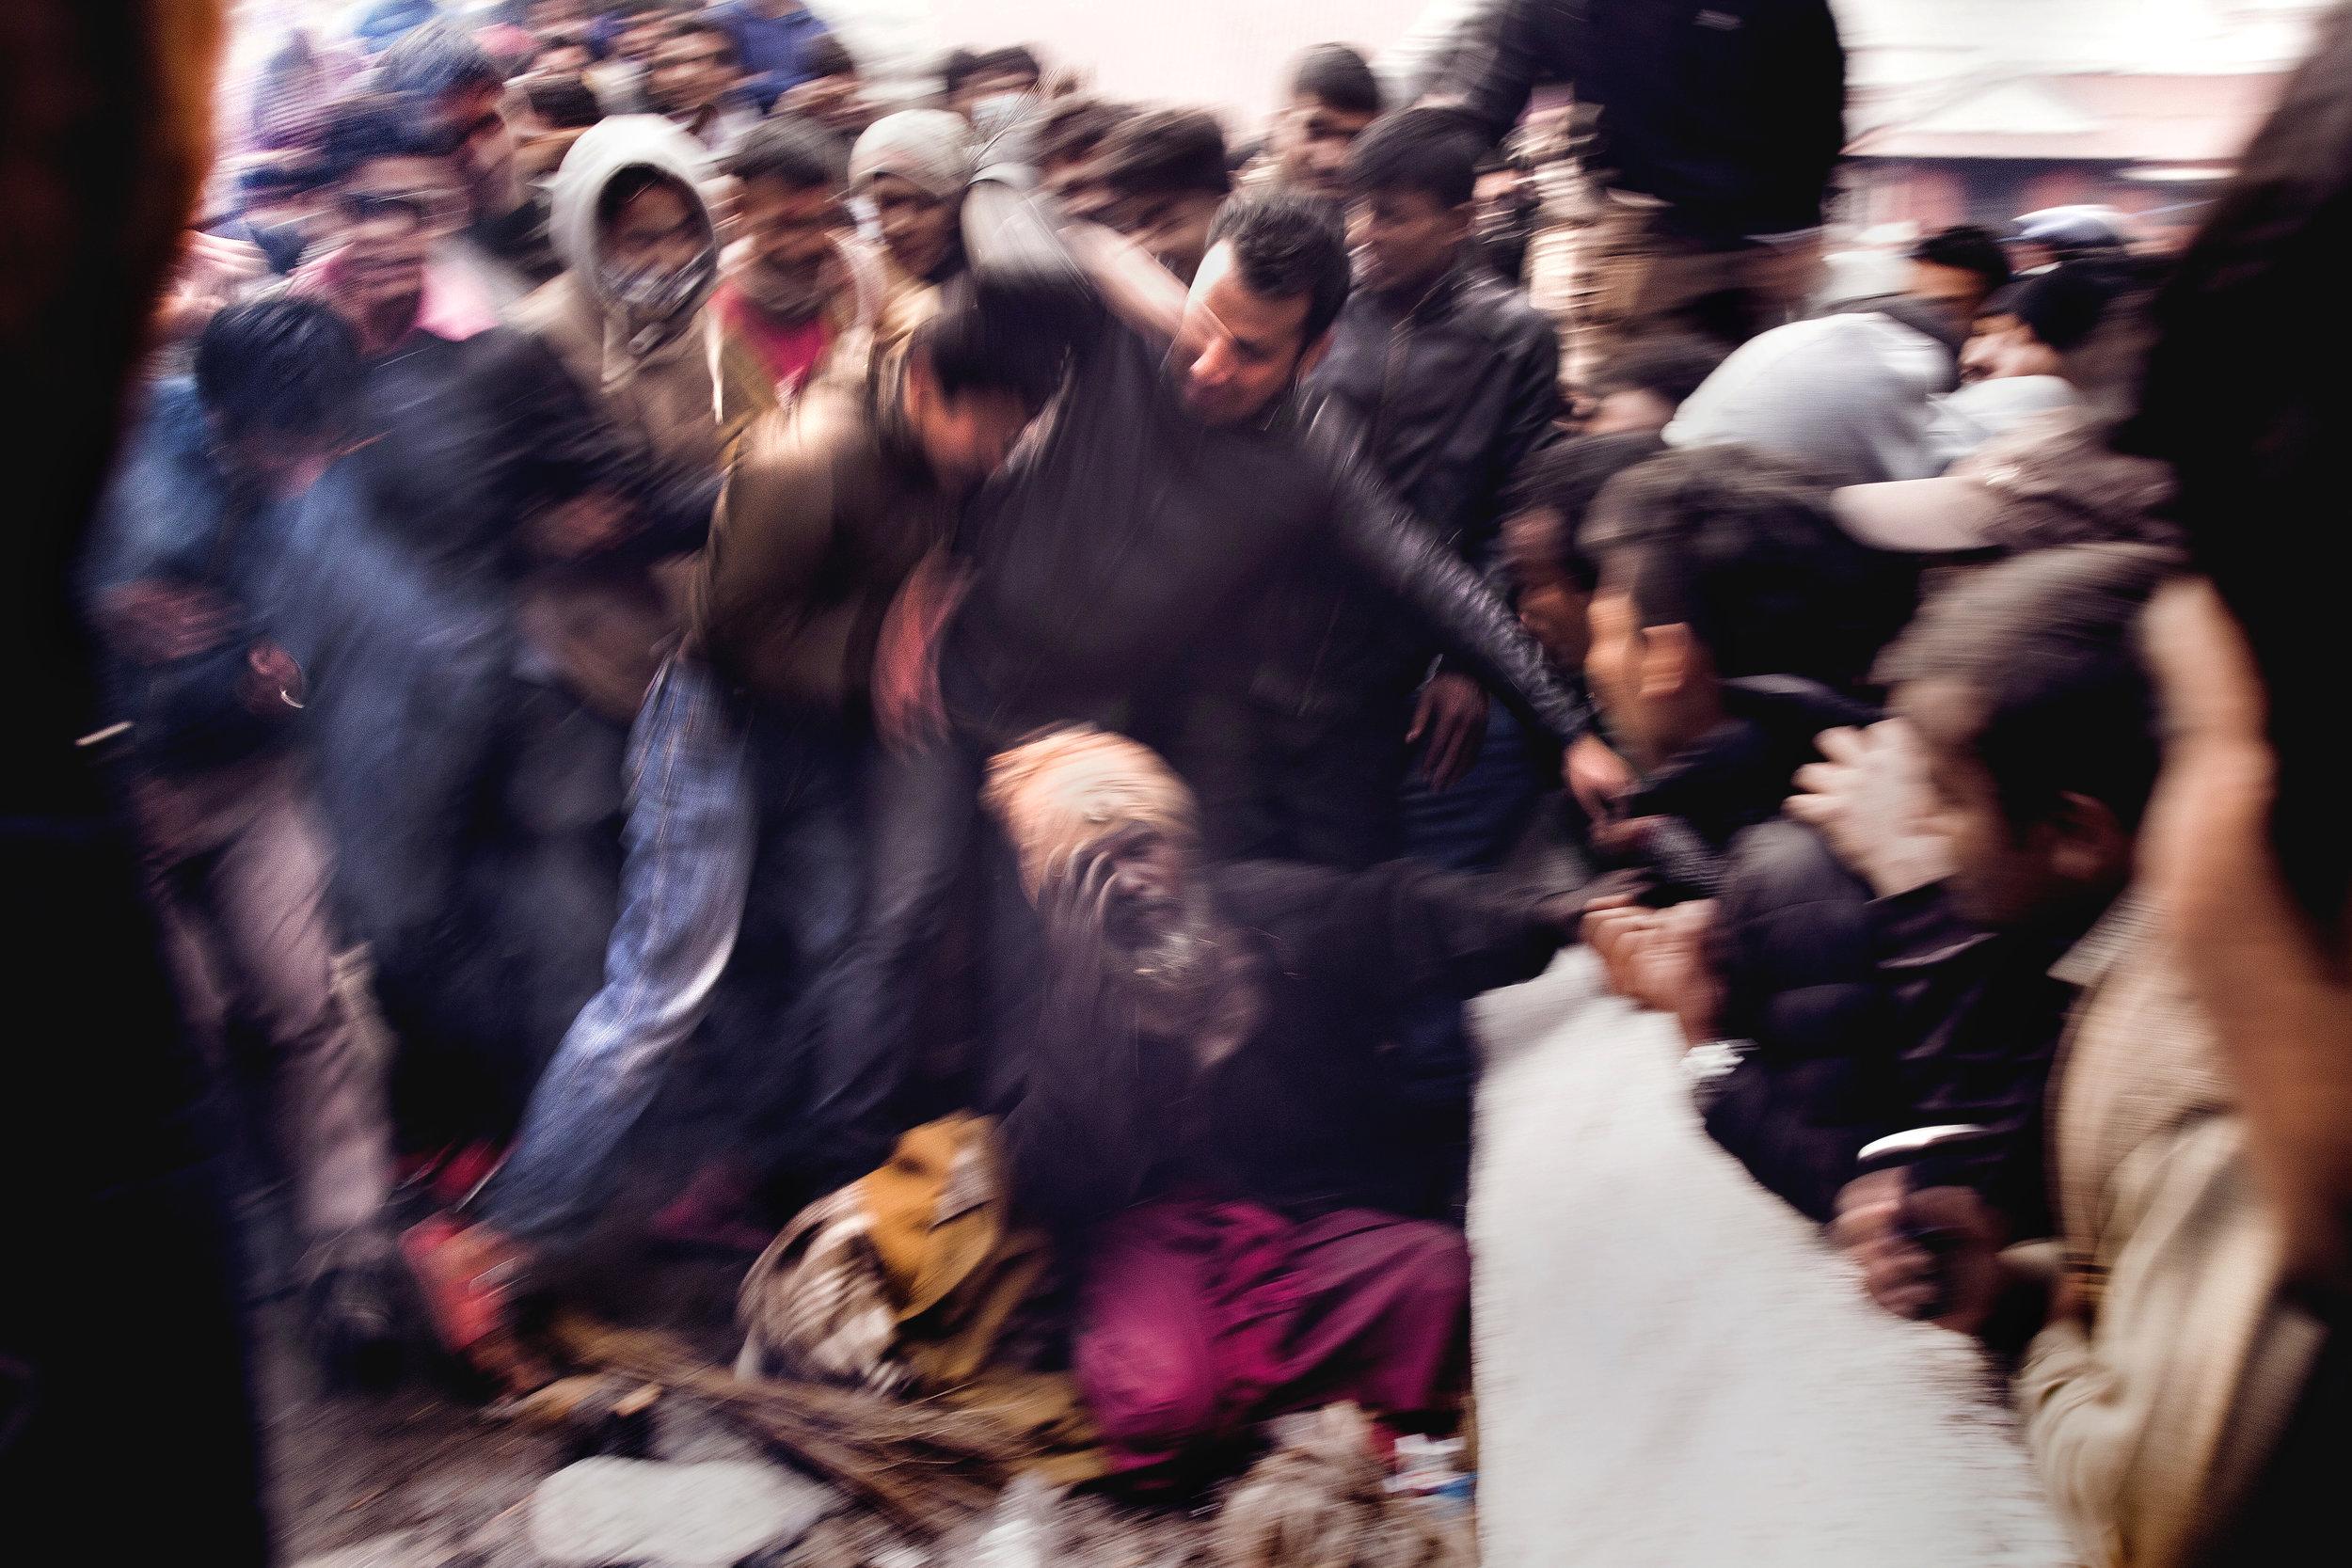 19_MAHA SHIVARATRI_A group of 'stoned' men attack a sadhu over a money dispute on Maha Shivaratri.jpg